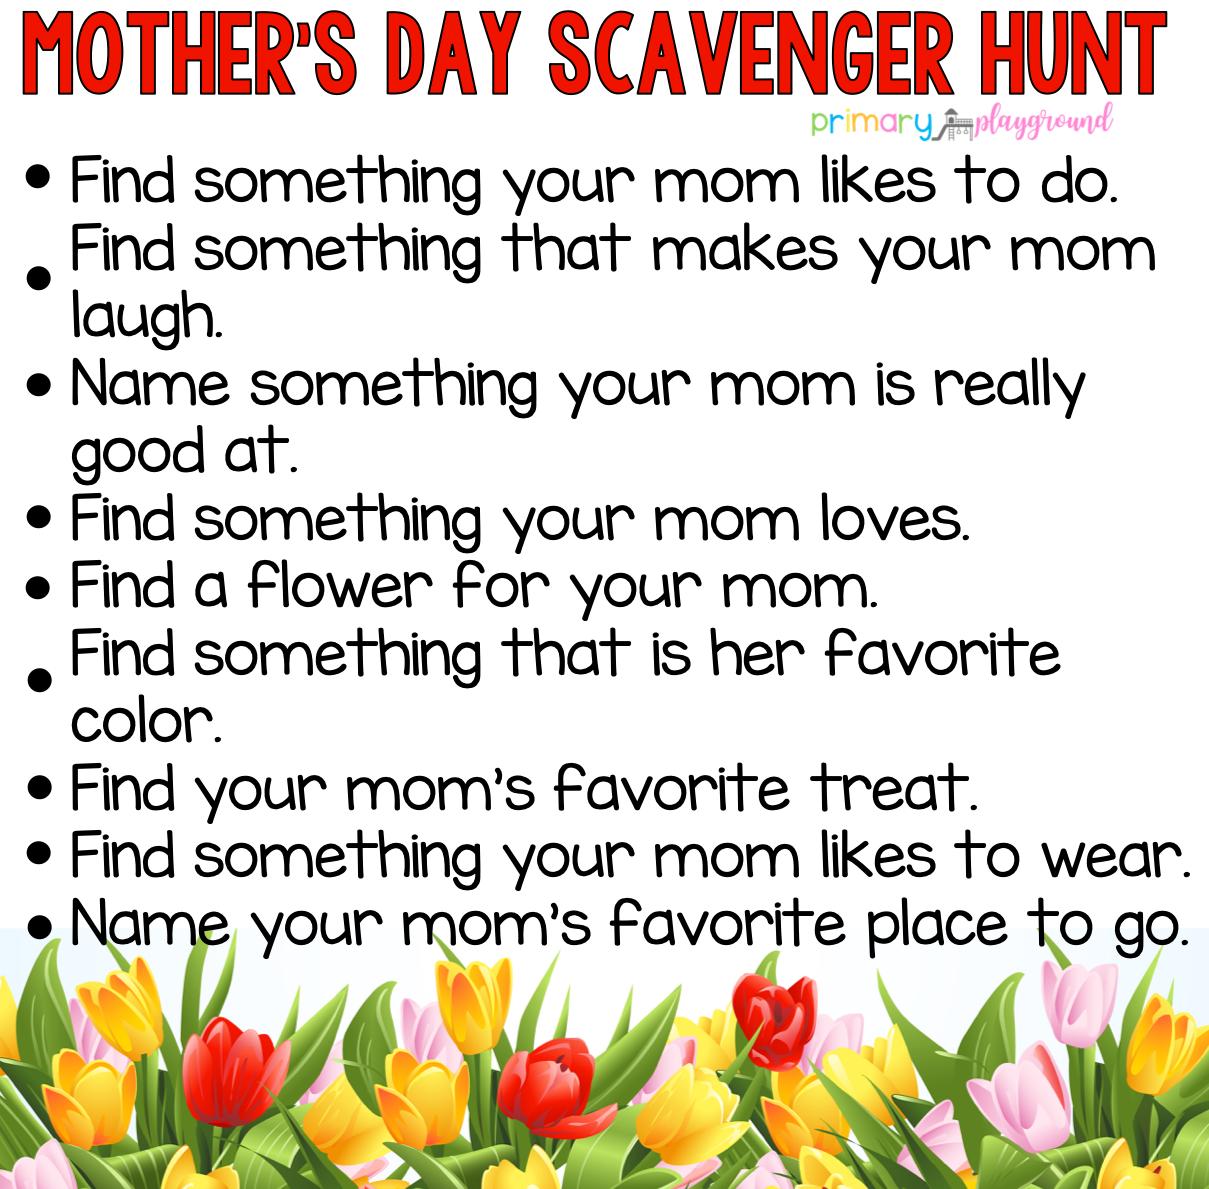 Mother's Day Scavenger Hunt